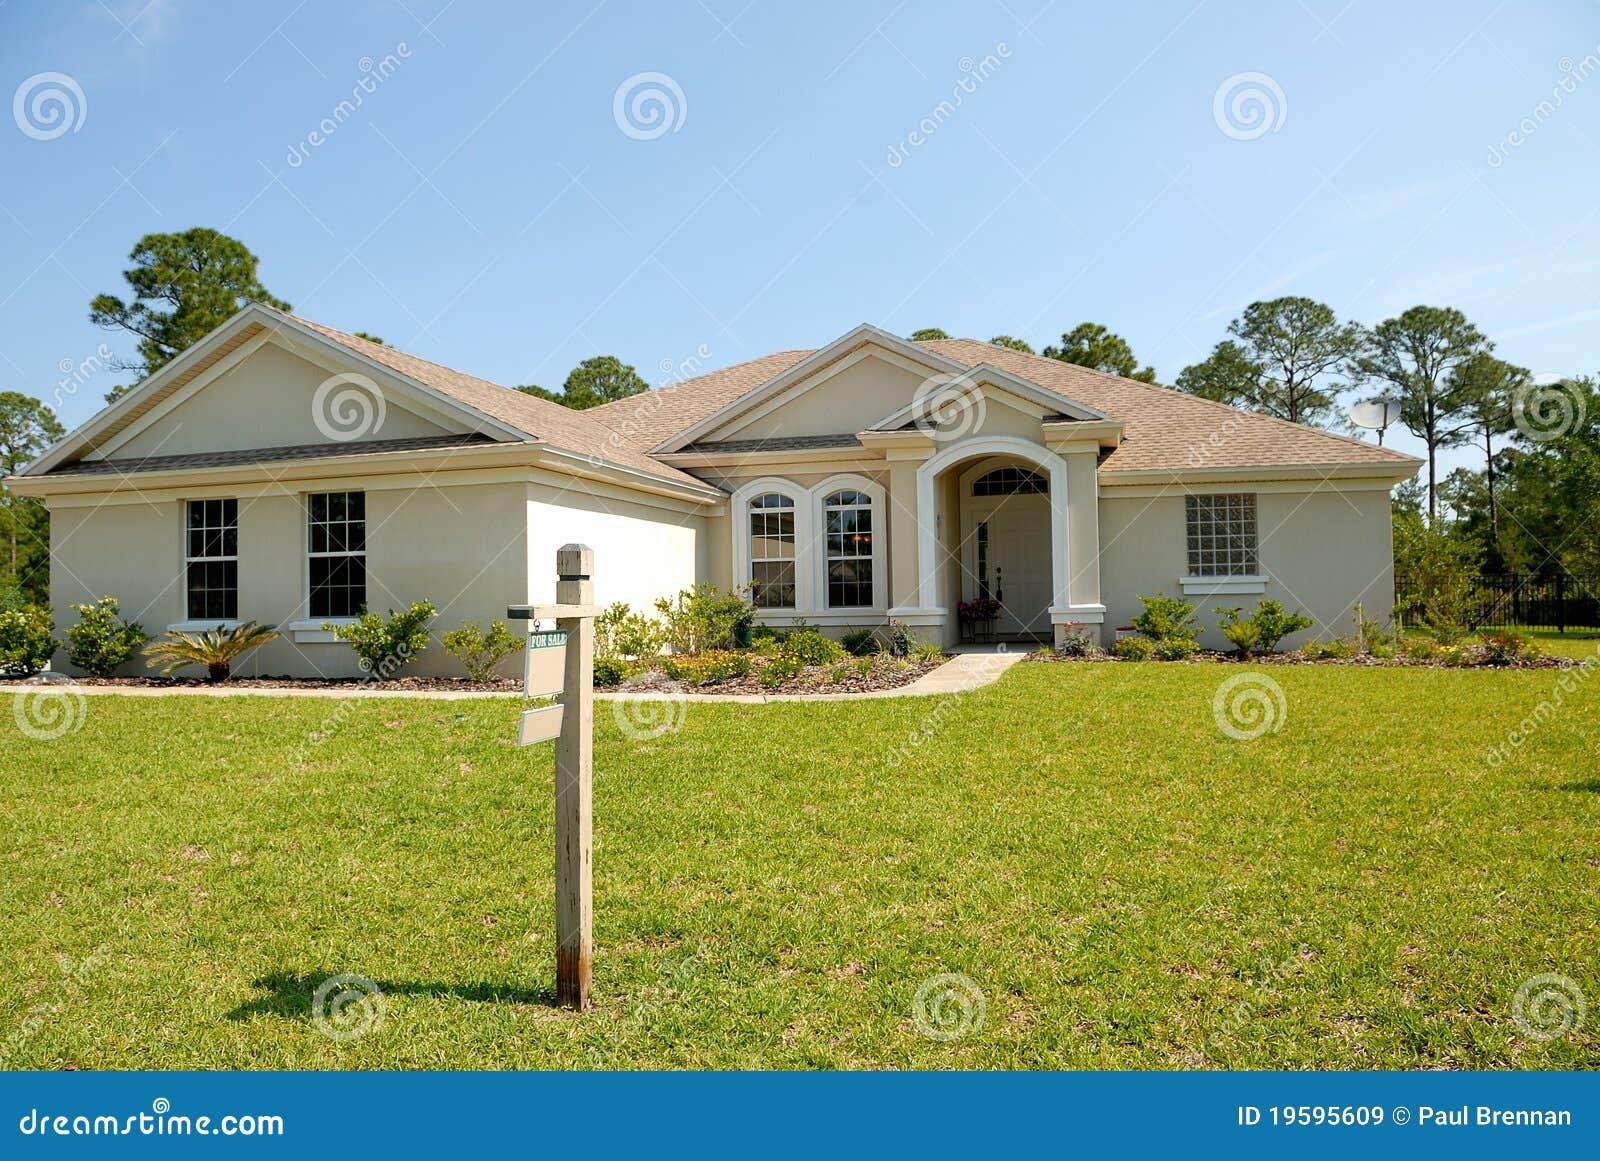 Modern american single story modern house for sale